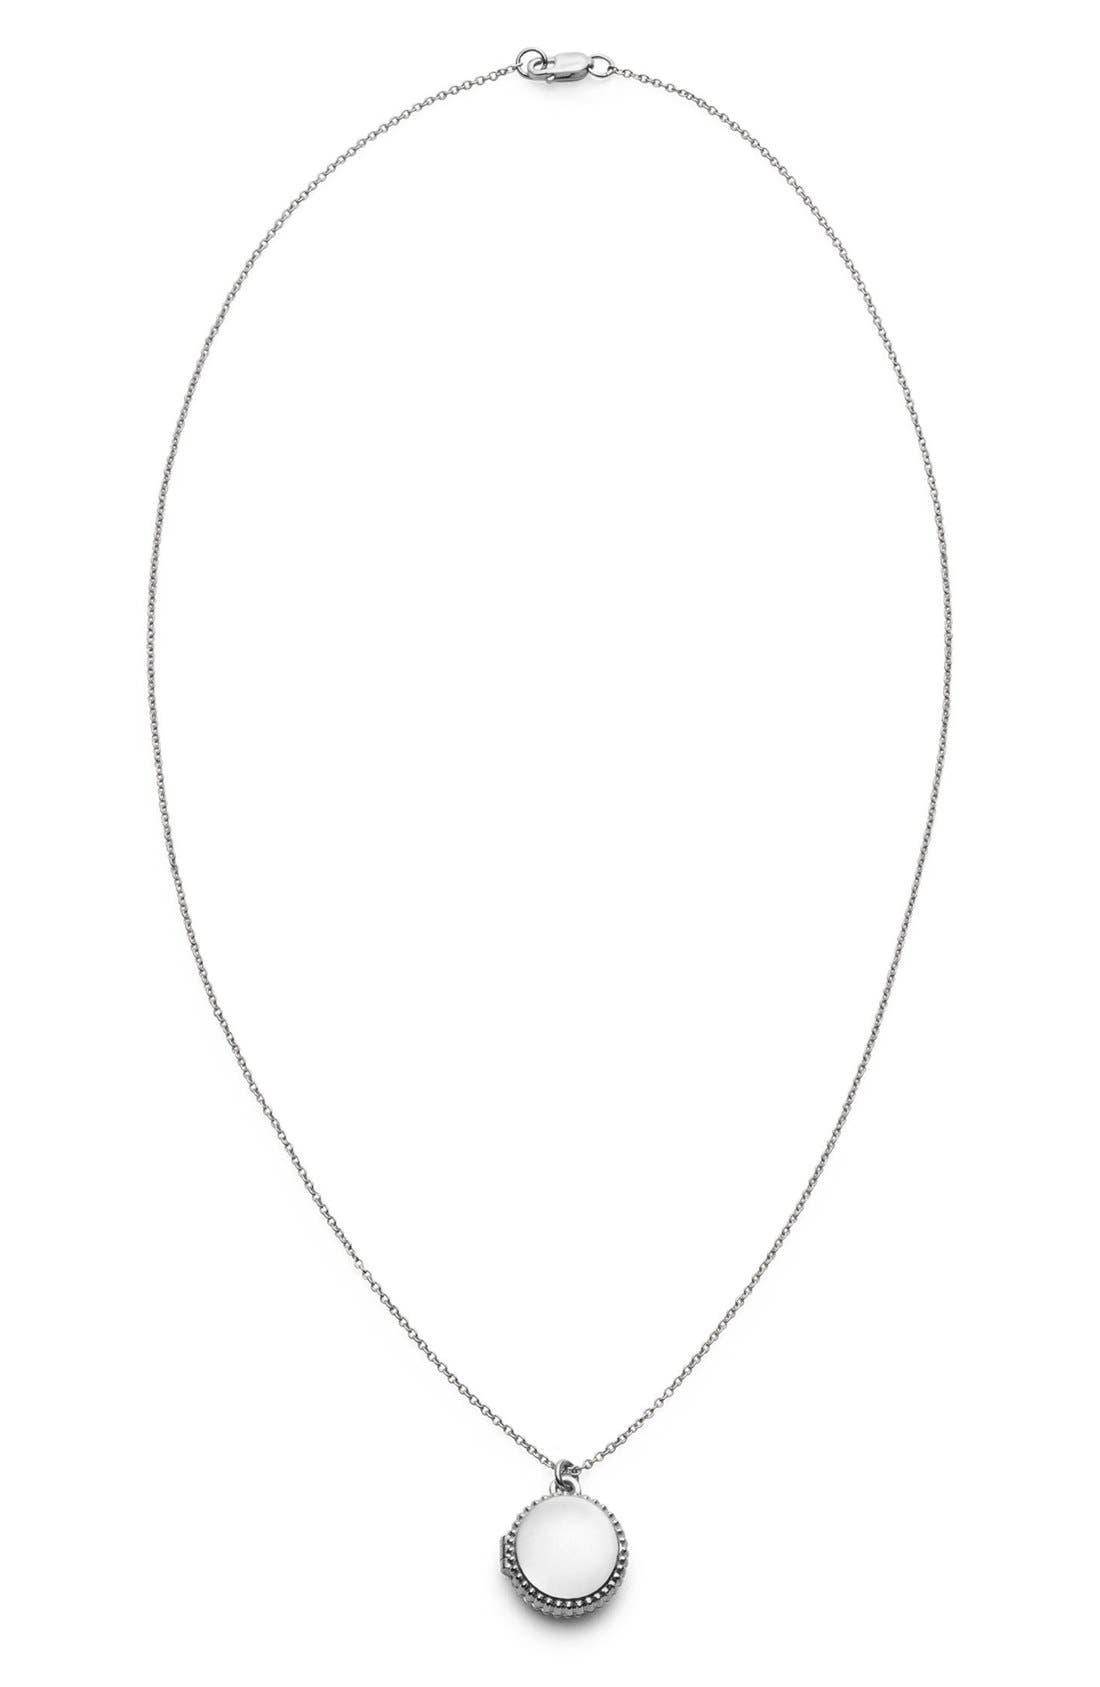 Main Image - Shinola Coin Edge Locket Necklace